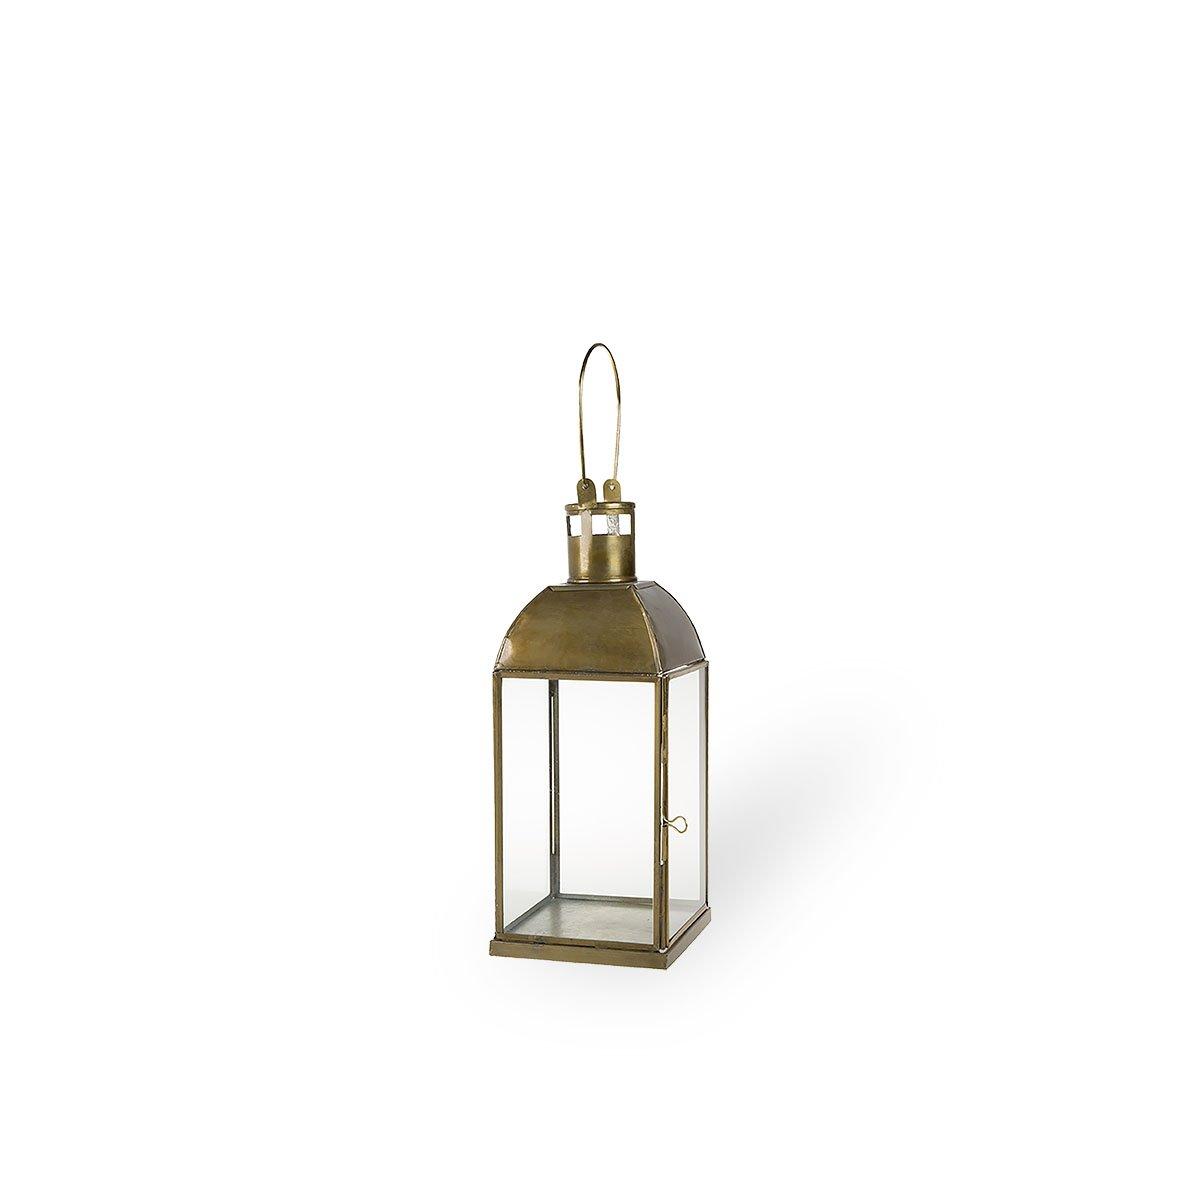 Sika Design Laterne Brass Klein Messing